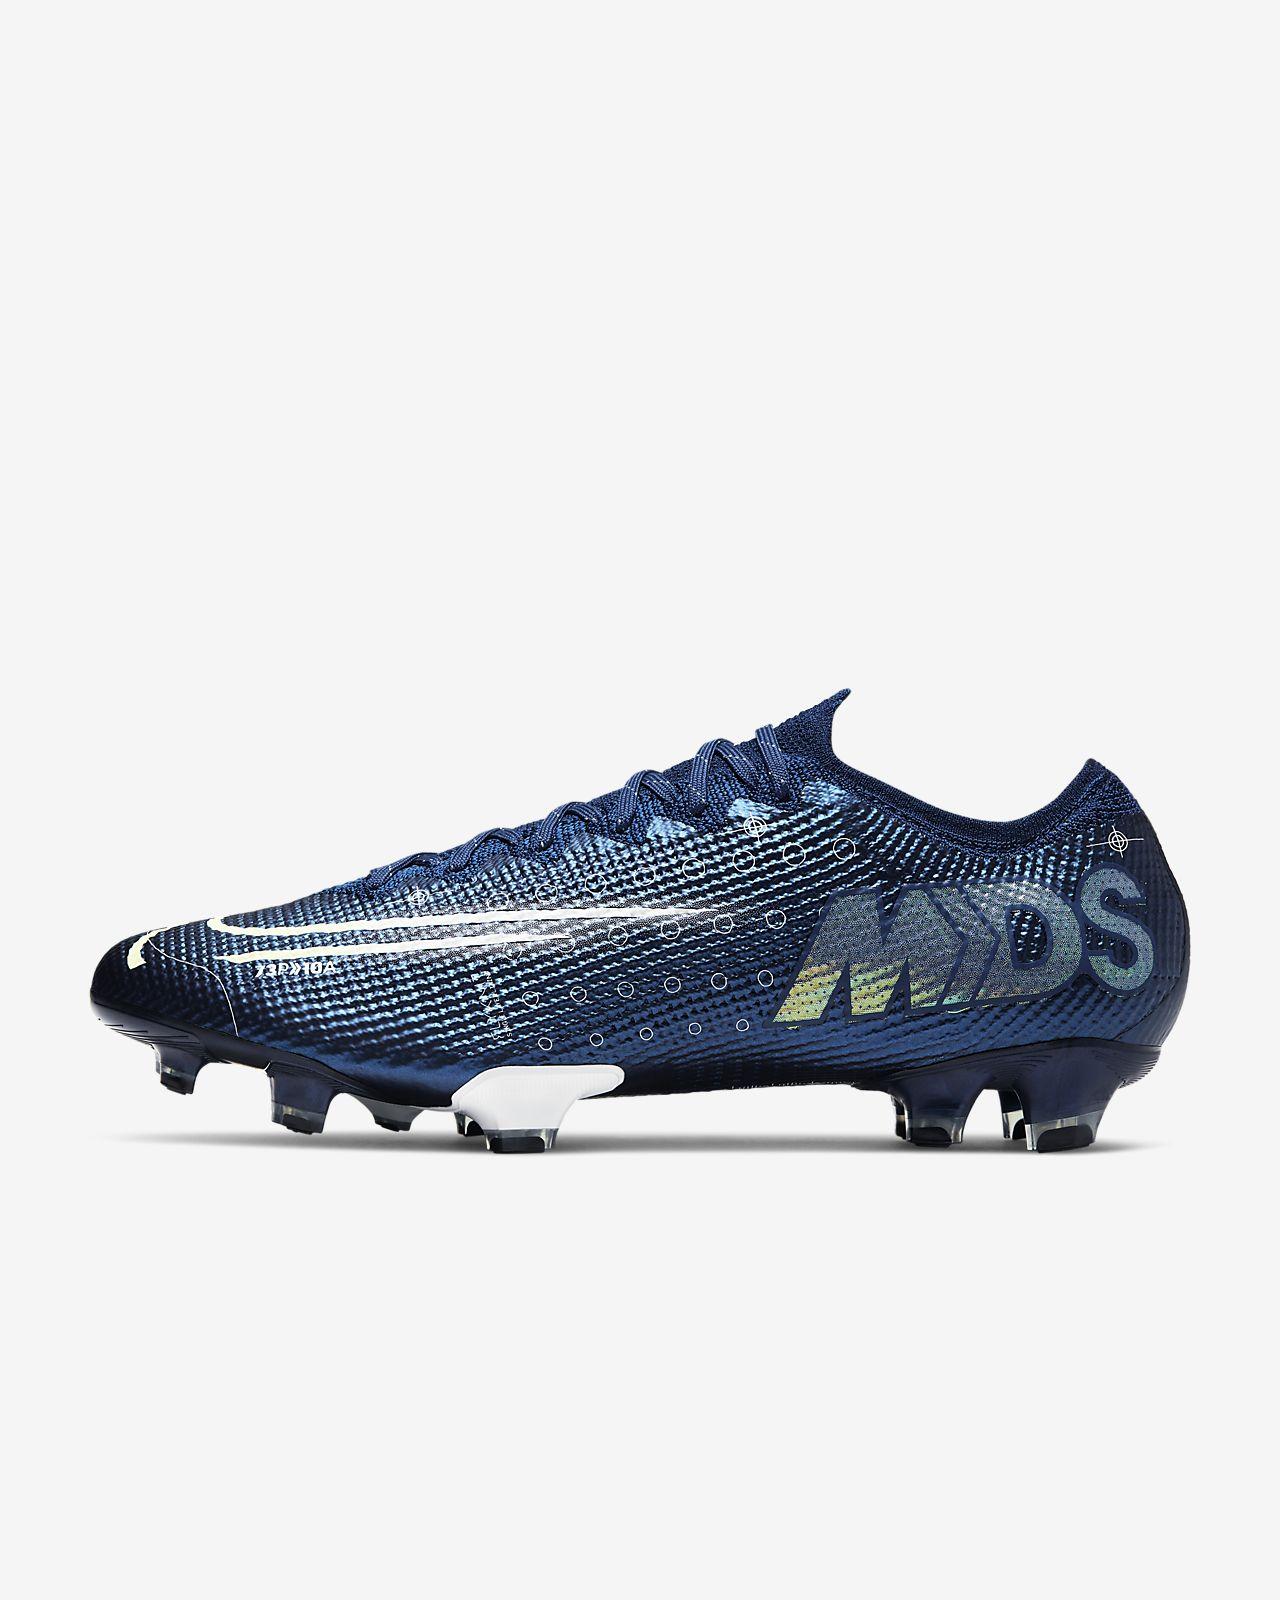 Scarpa da calcio per terreni duri Nike Mercurial Vapor 13 Elite MDS FG